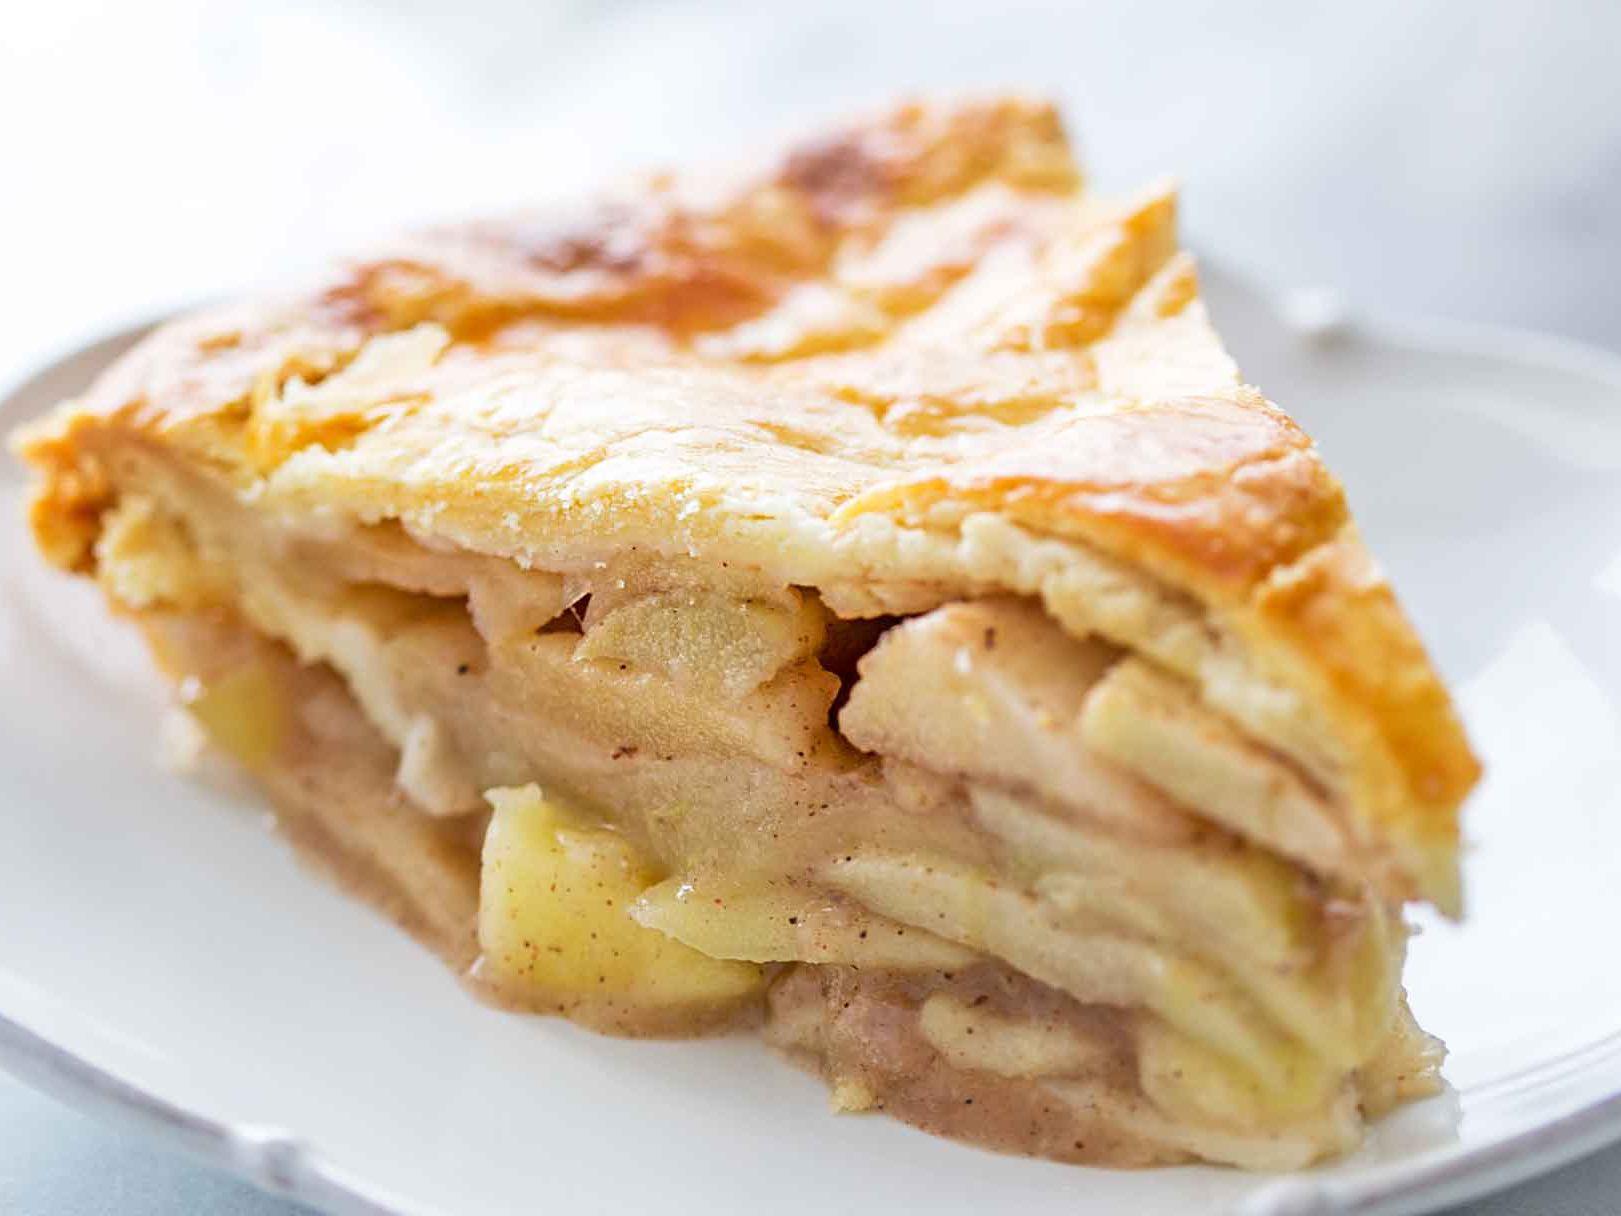 Homemade Apple Pie Just Like Mom's